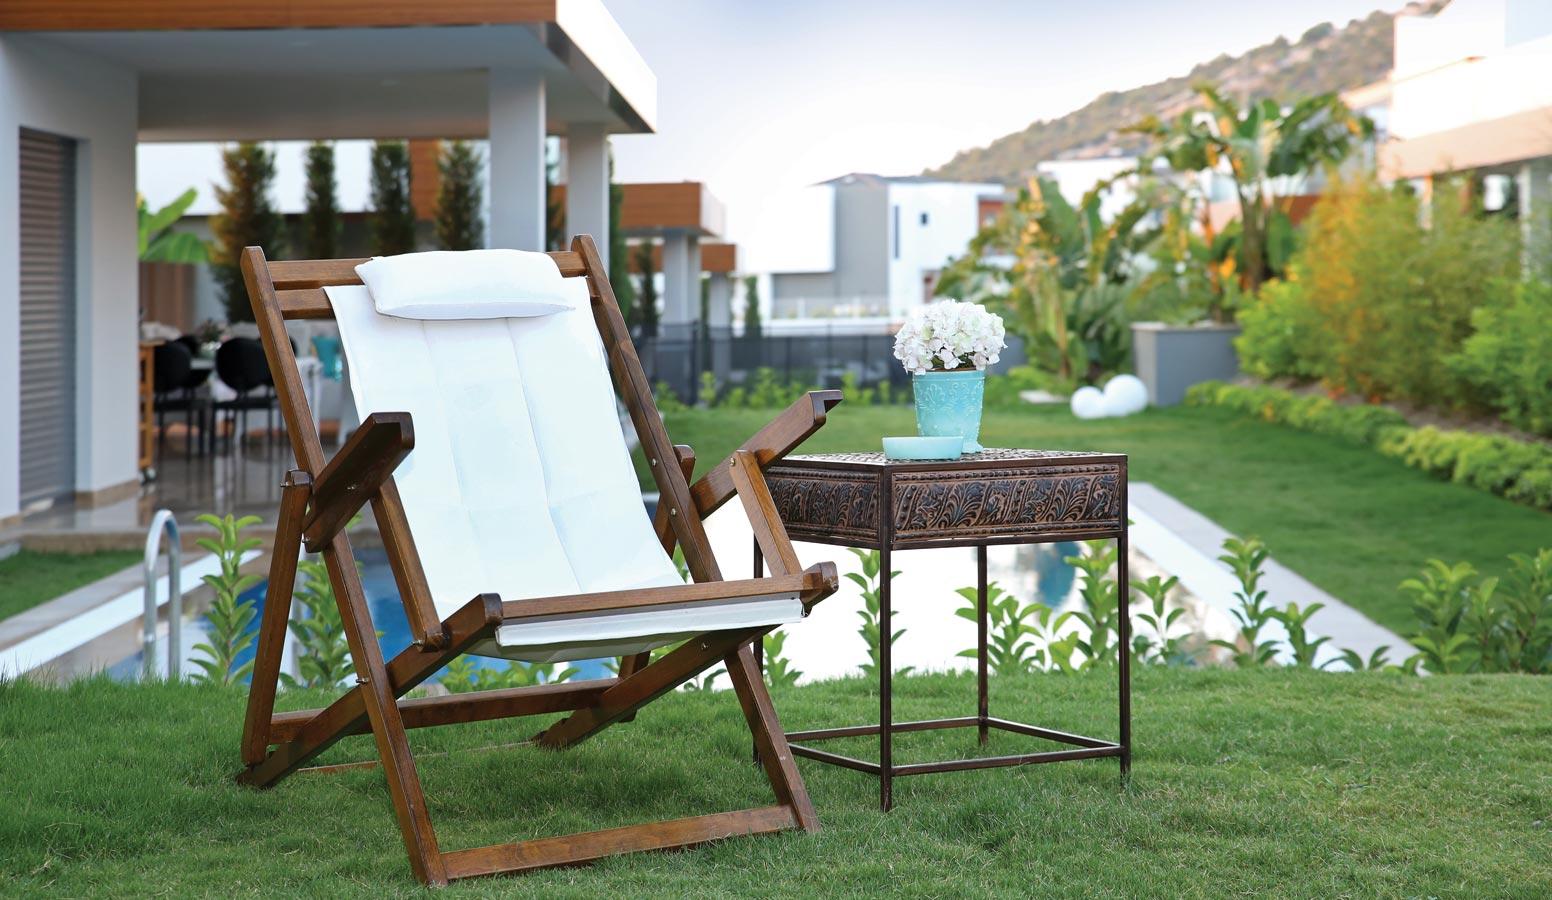 Mi'Marin Ilıca Villaları bahçe